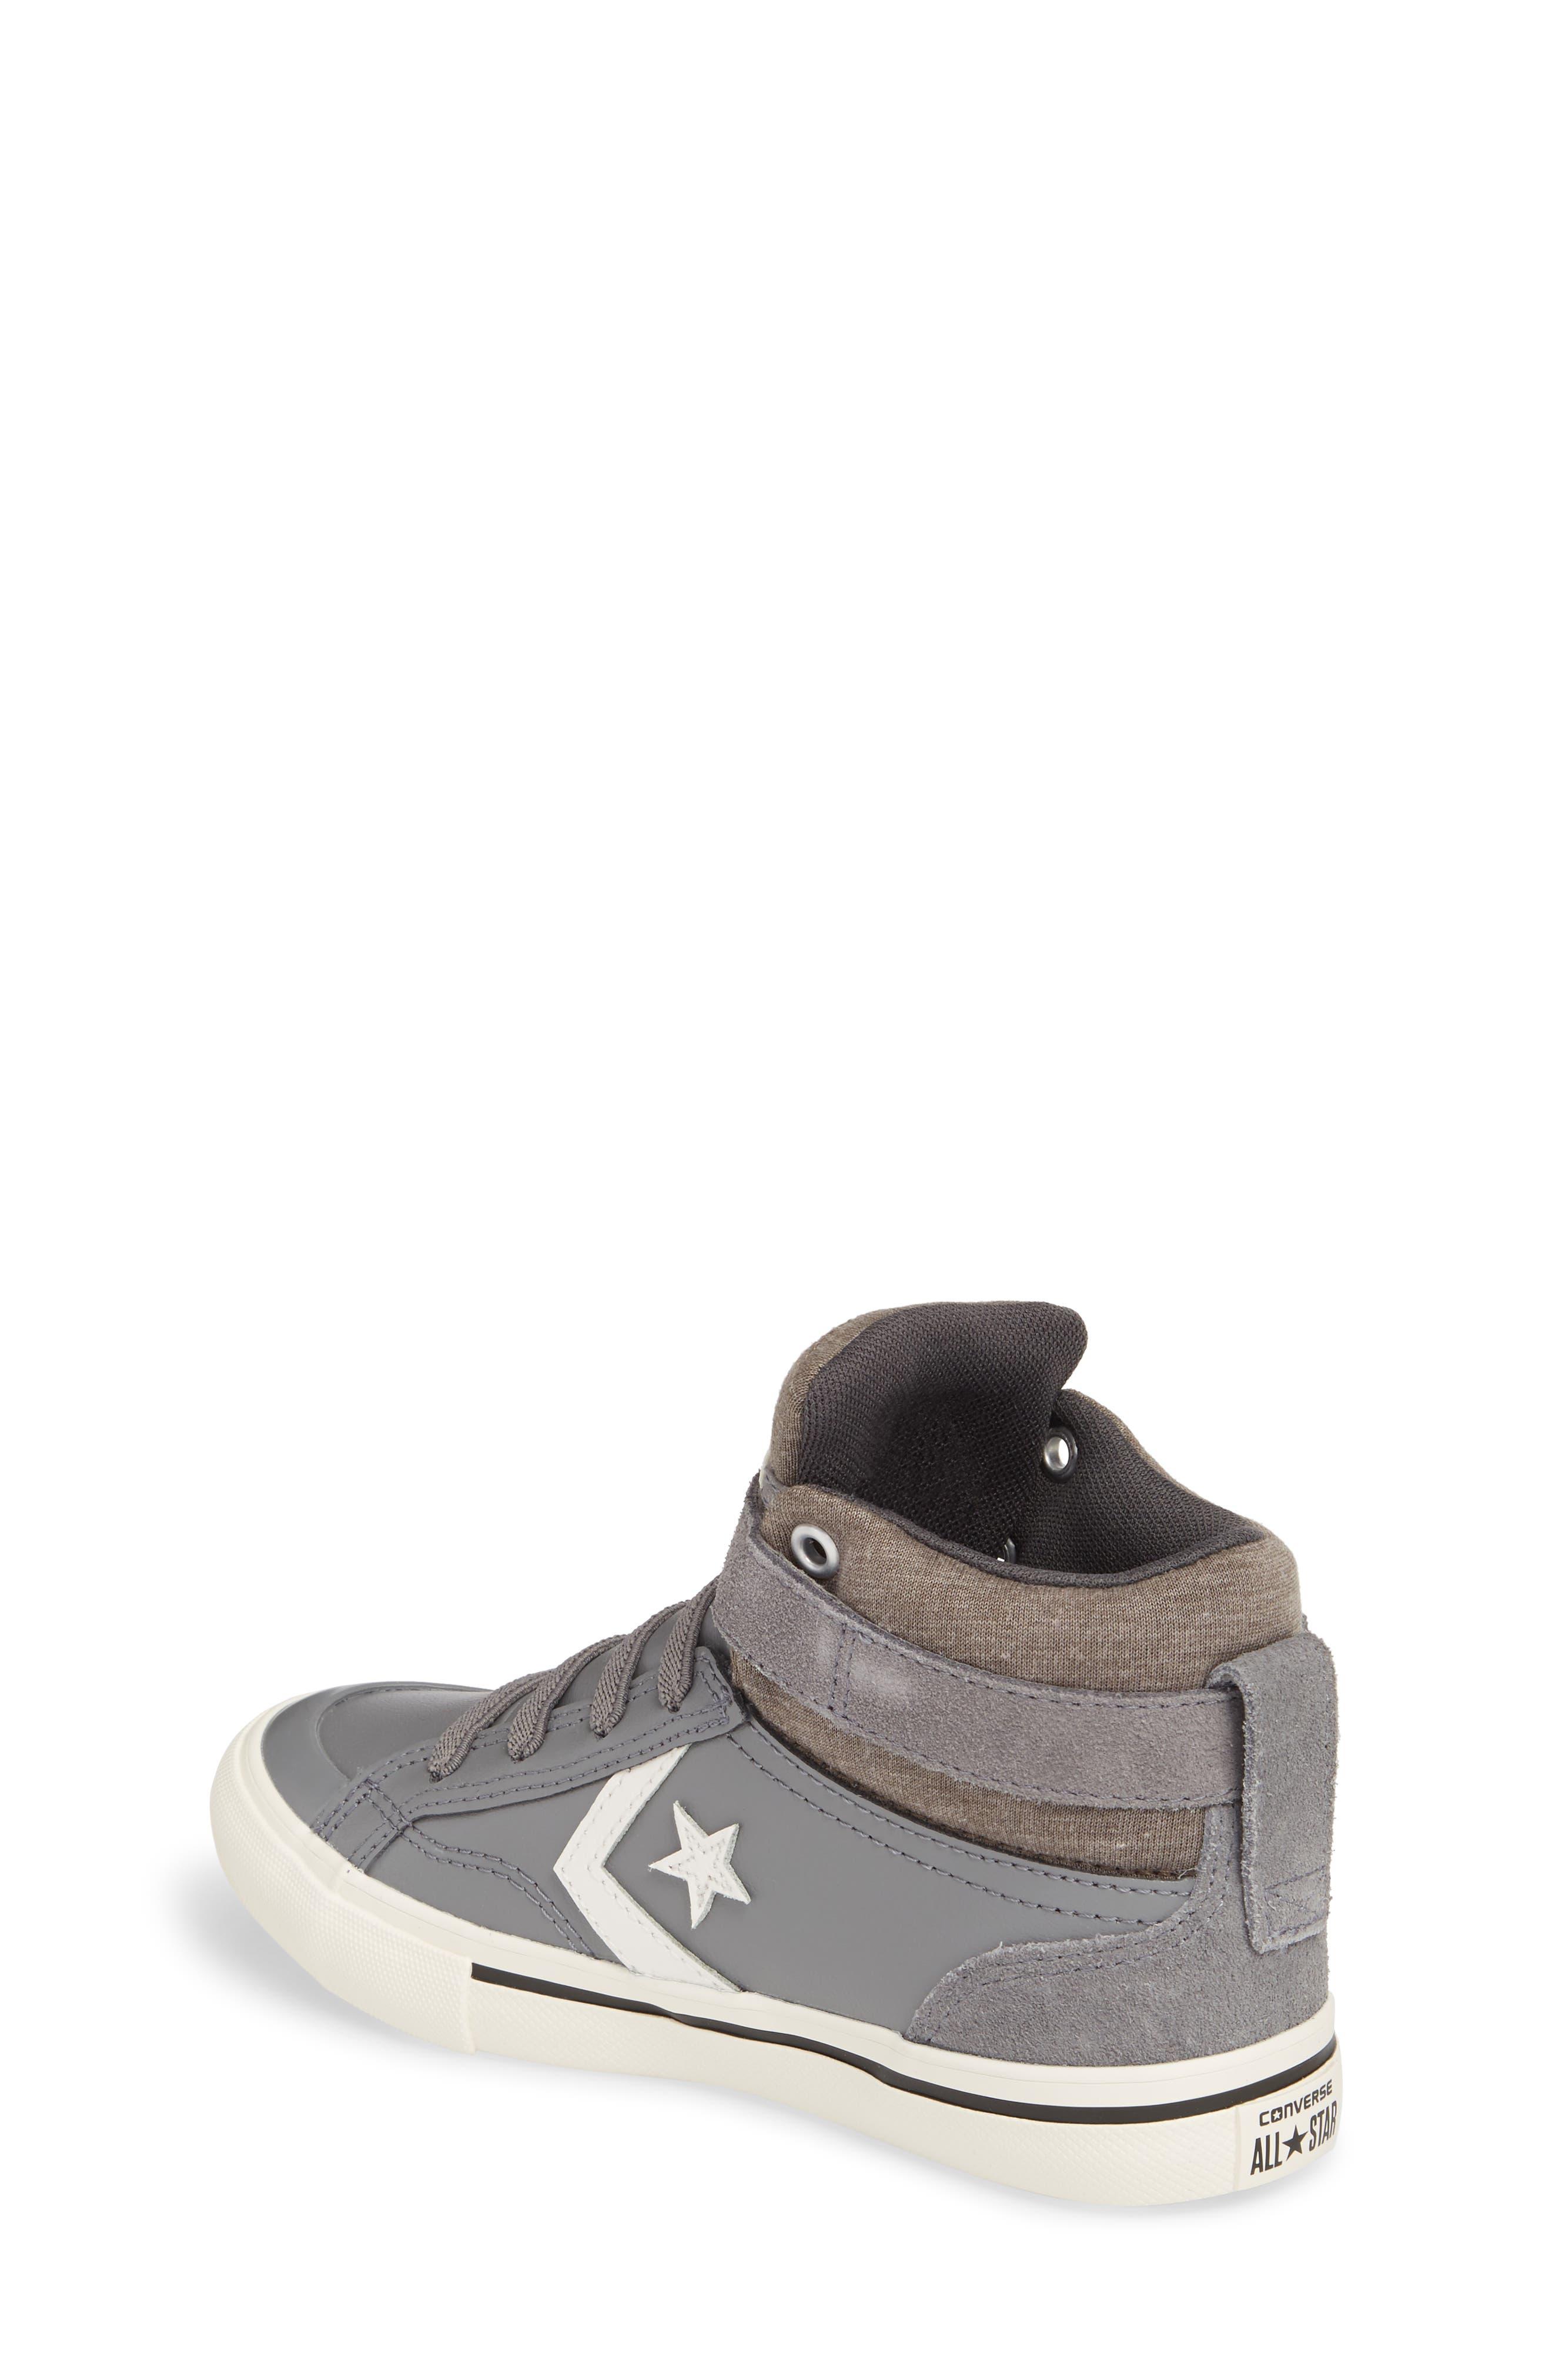 Pro Blaze High Top Sneaker,                             Alternate thumbnail 2, color,                             Mason Leather